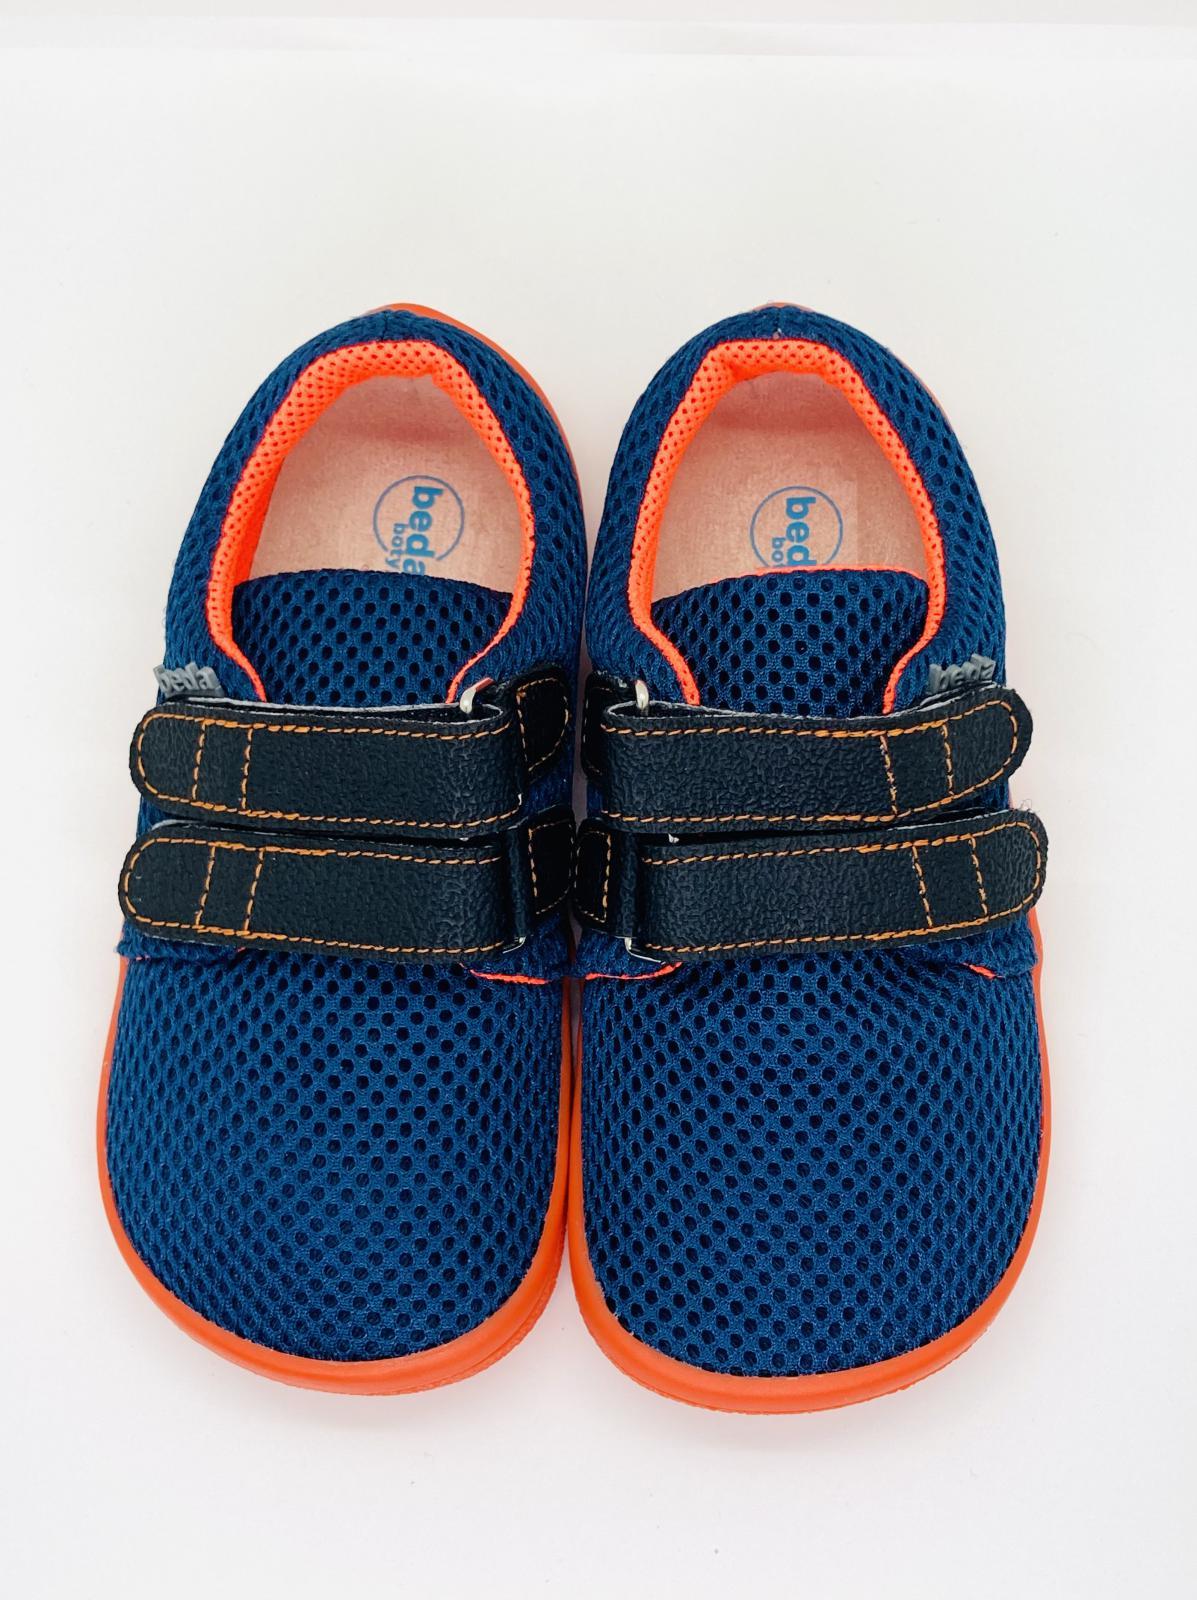 BEDA volnočasová obuv, BF 0001/ST/W Blue mandarine